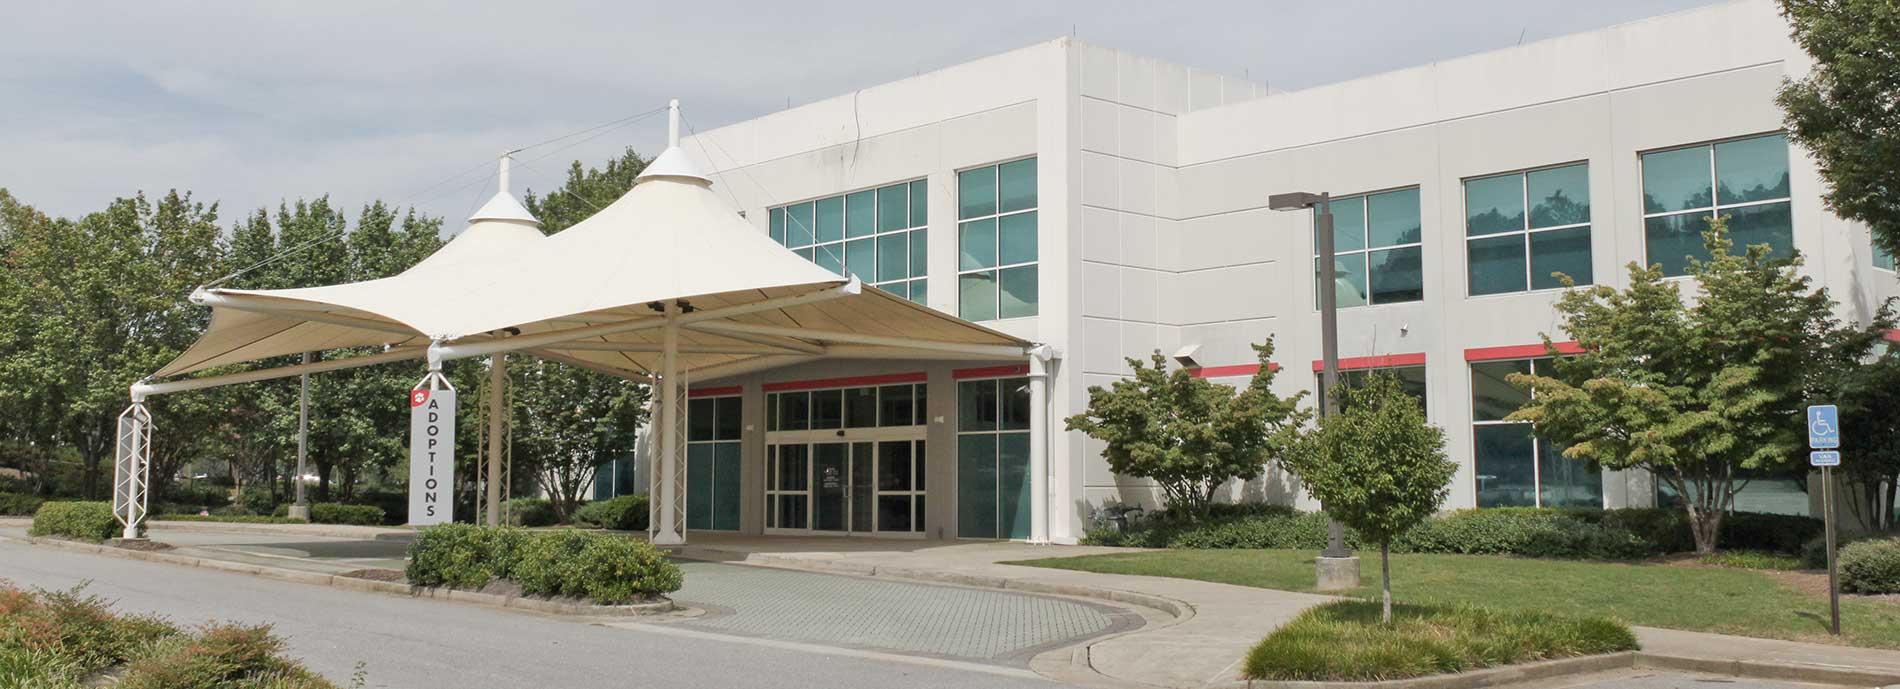 Atlanta Humane Society's Alpharetta Building